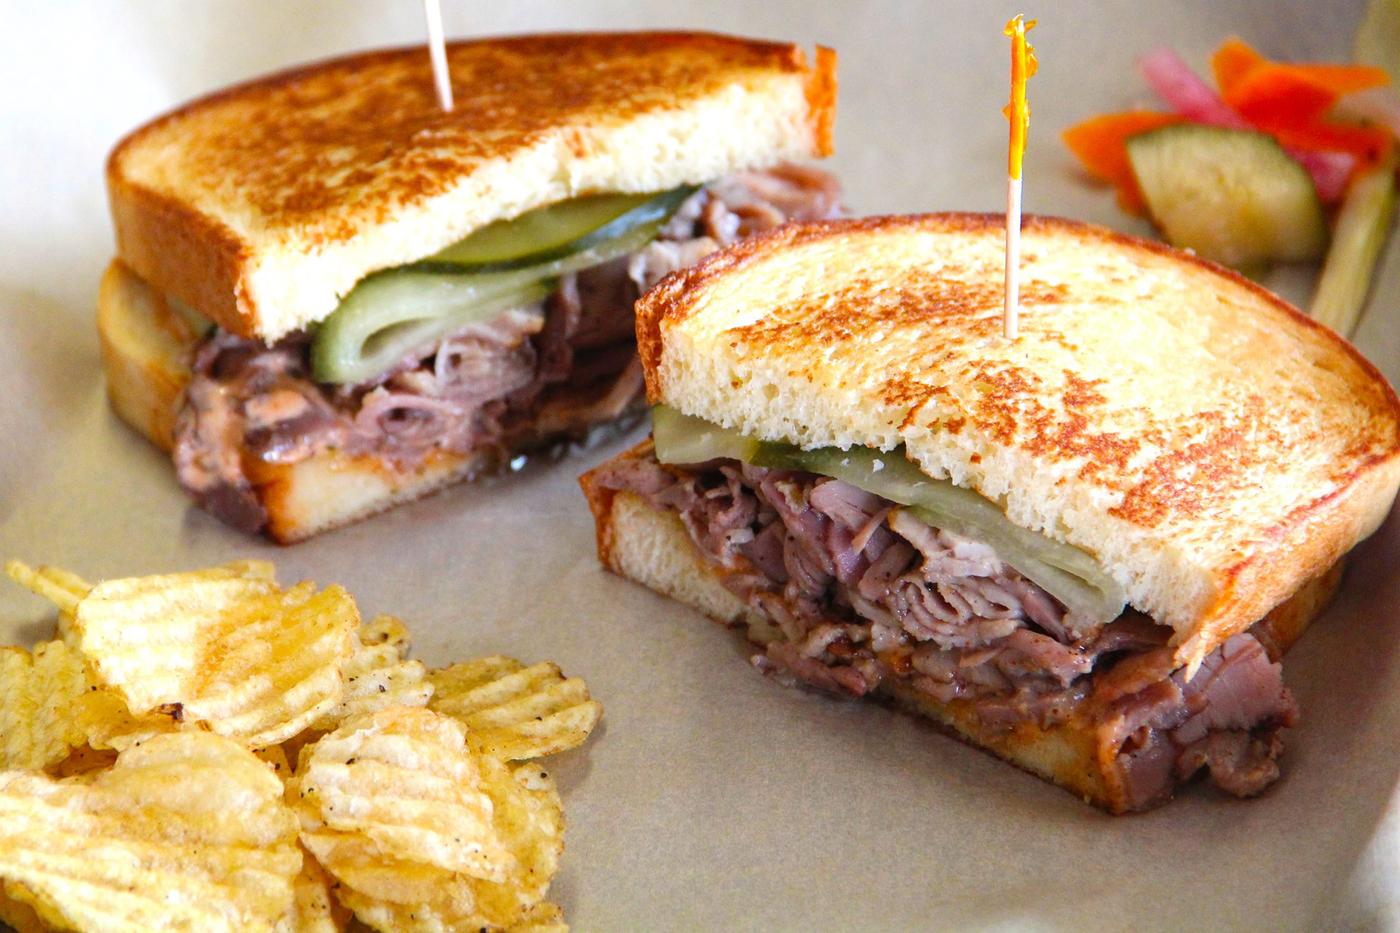 noble-sandwich-co-header.jpg